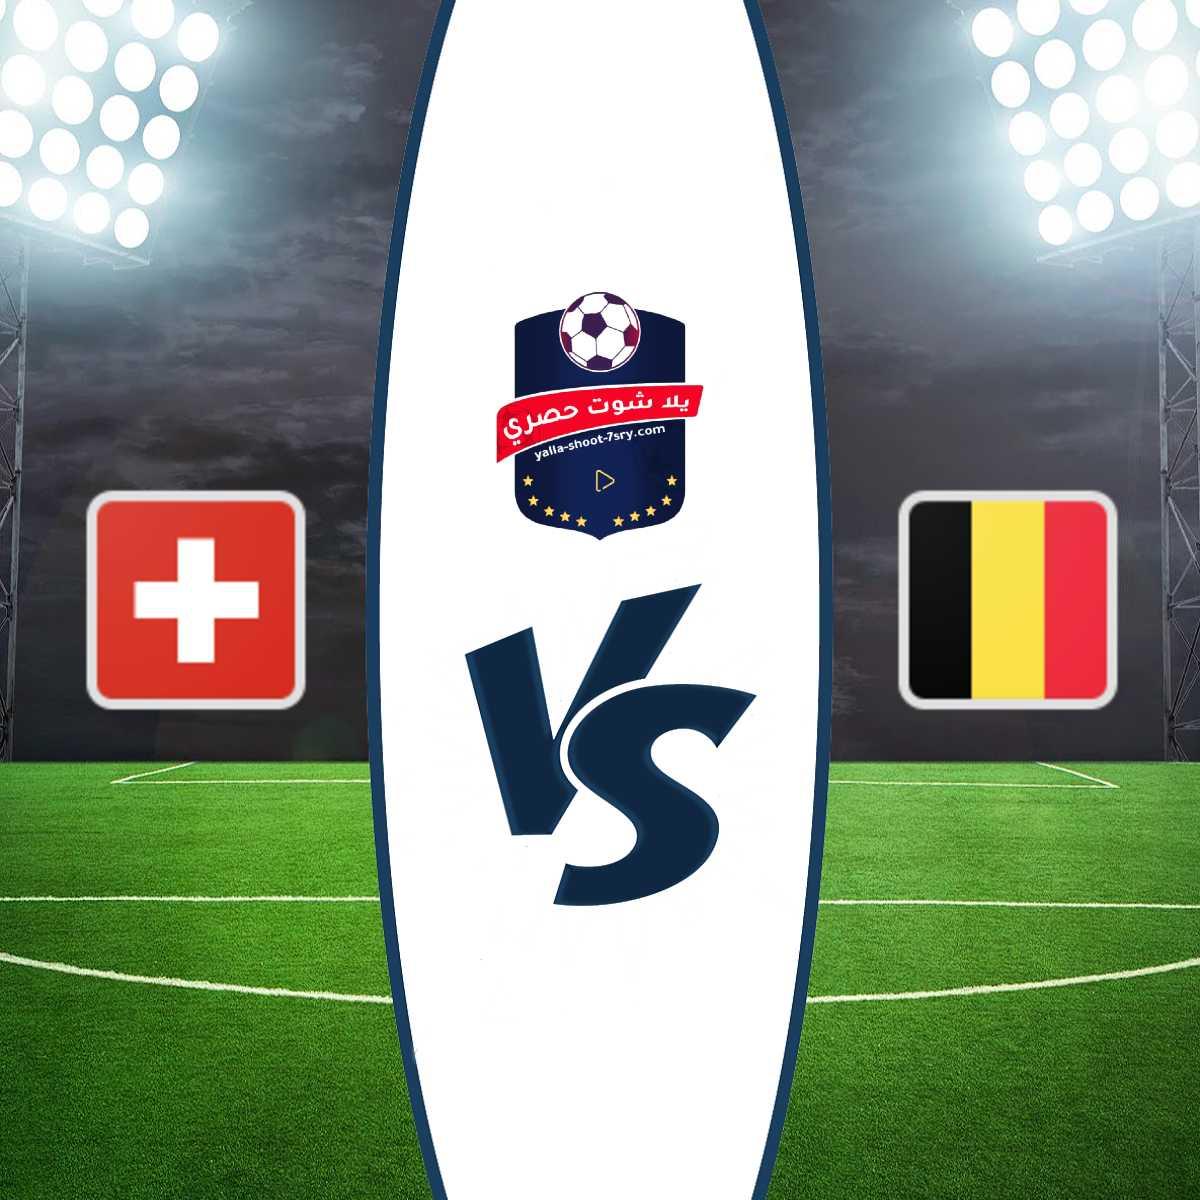 مشاهدة مباراة بلجيكا وسويسرا